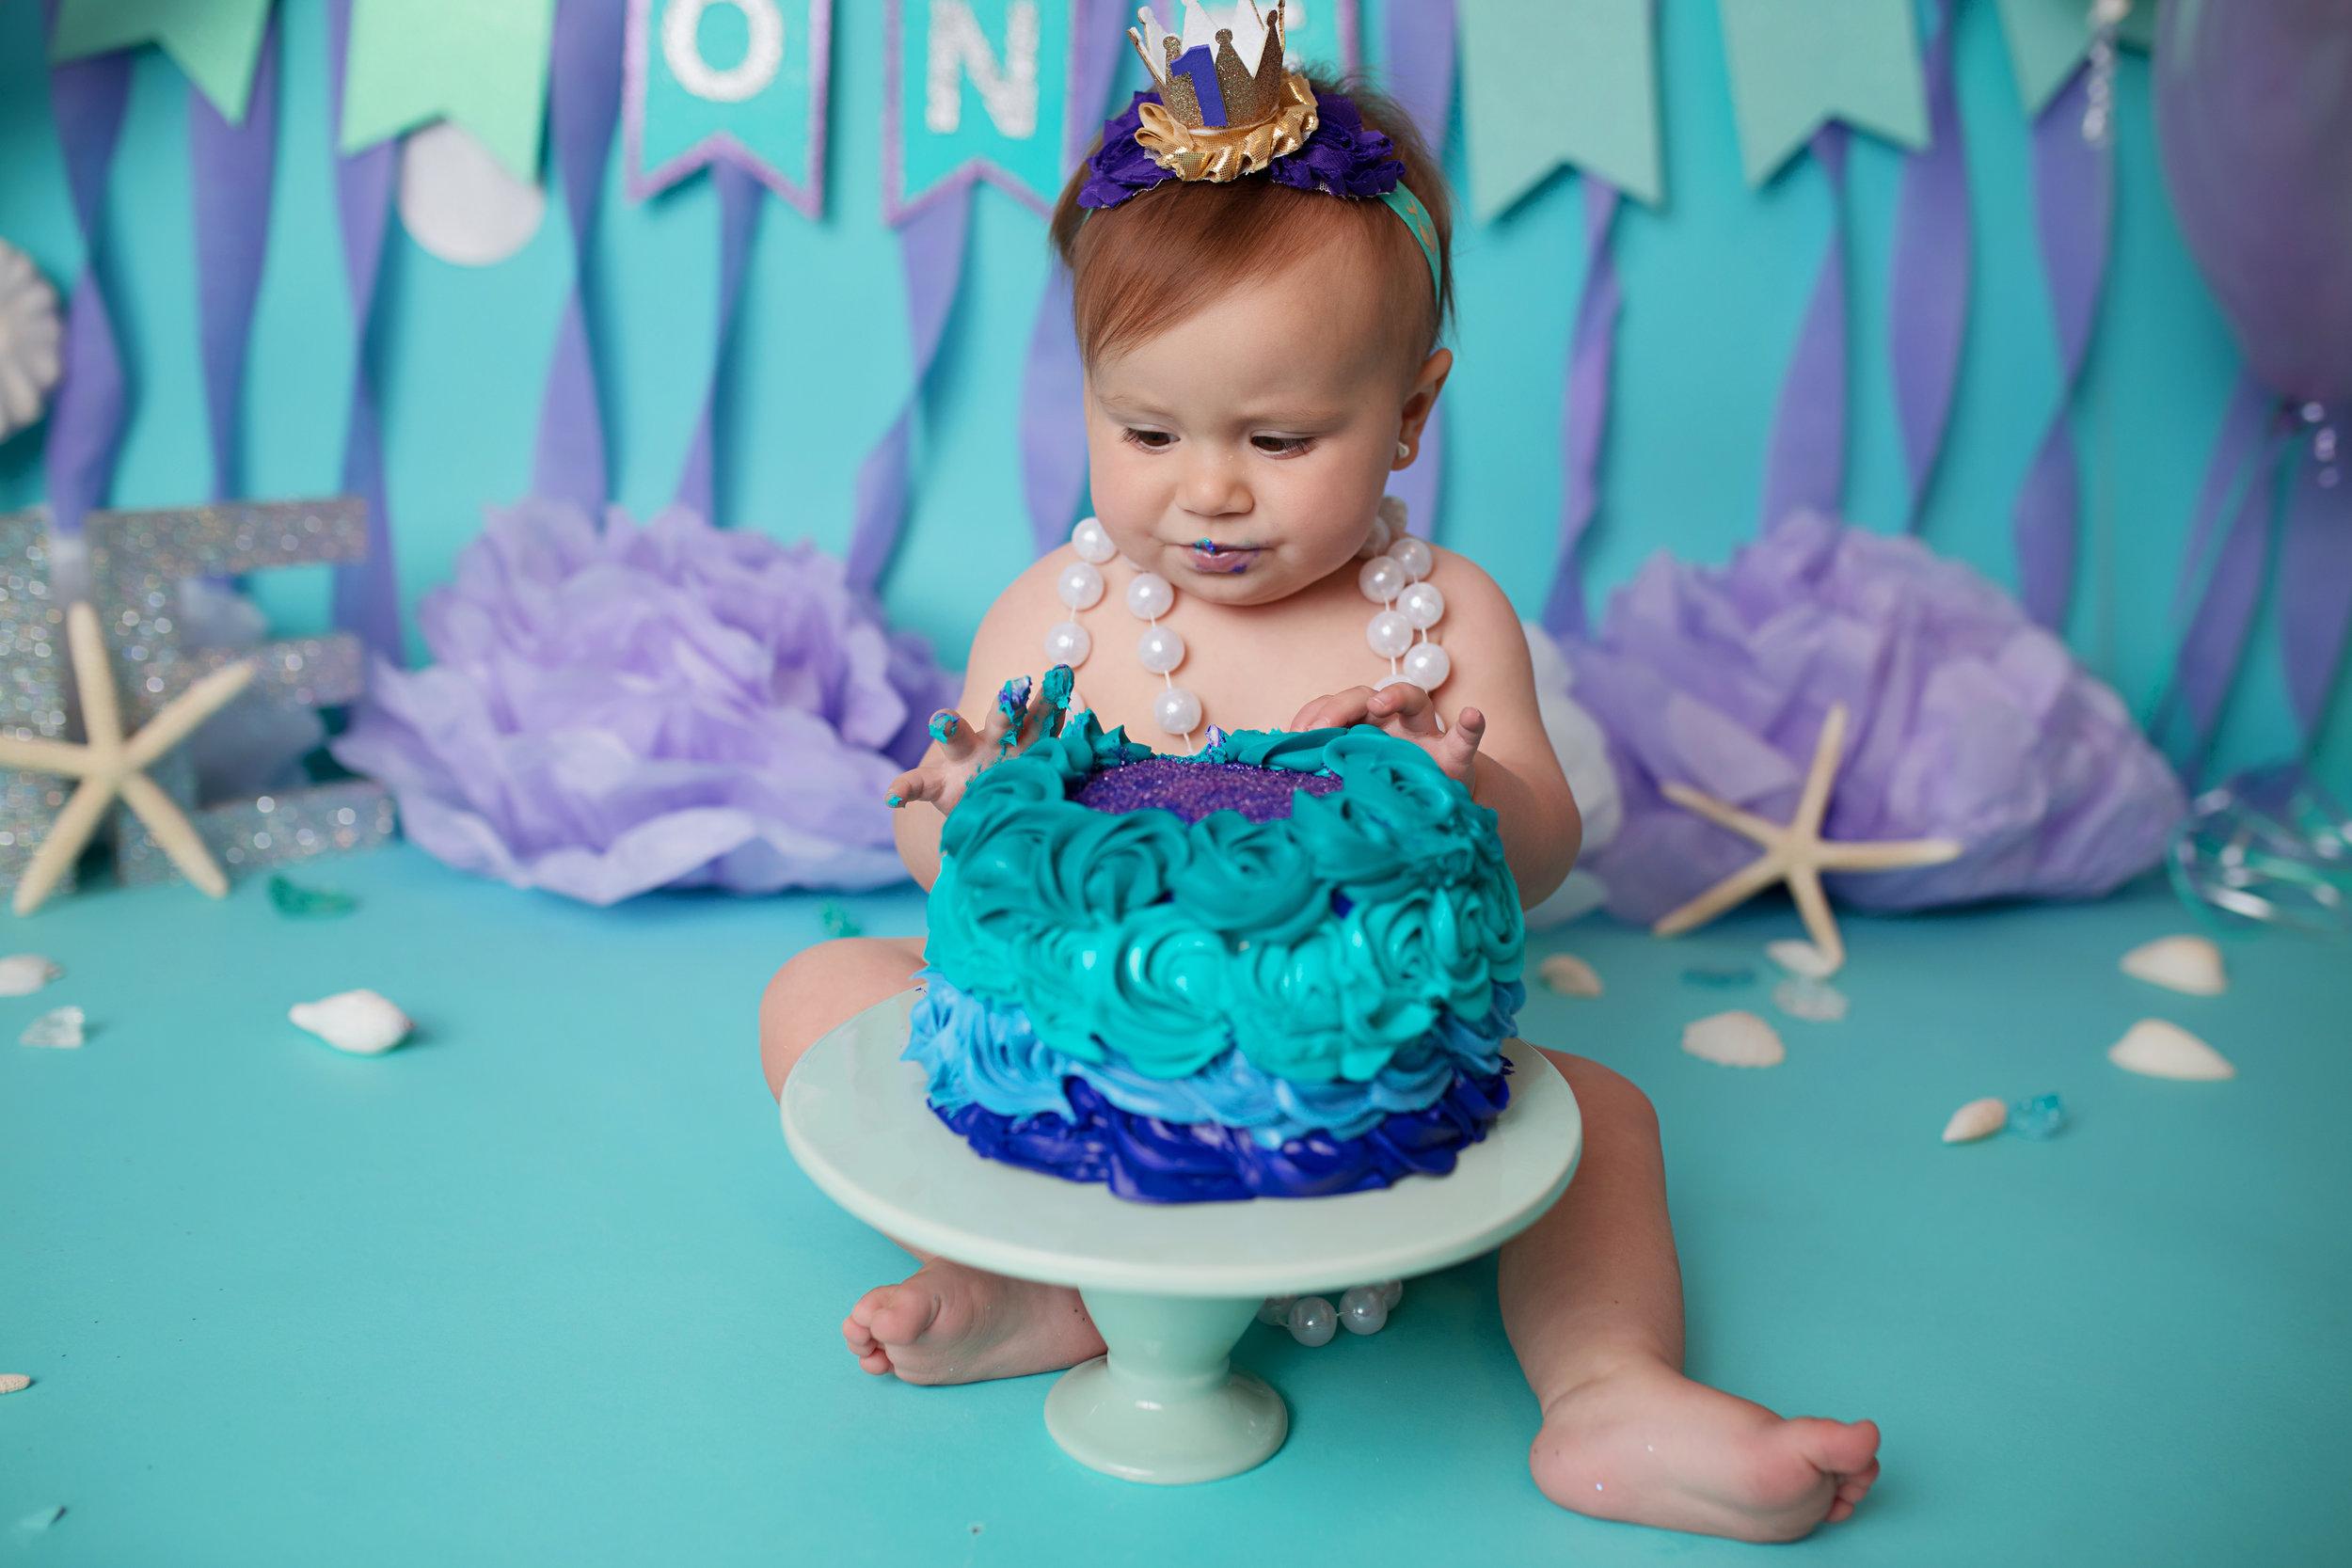 anchorage-cake-smash-photography-6.jpg